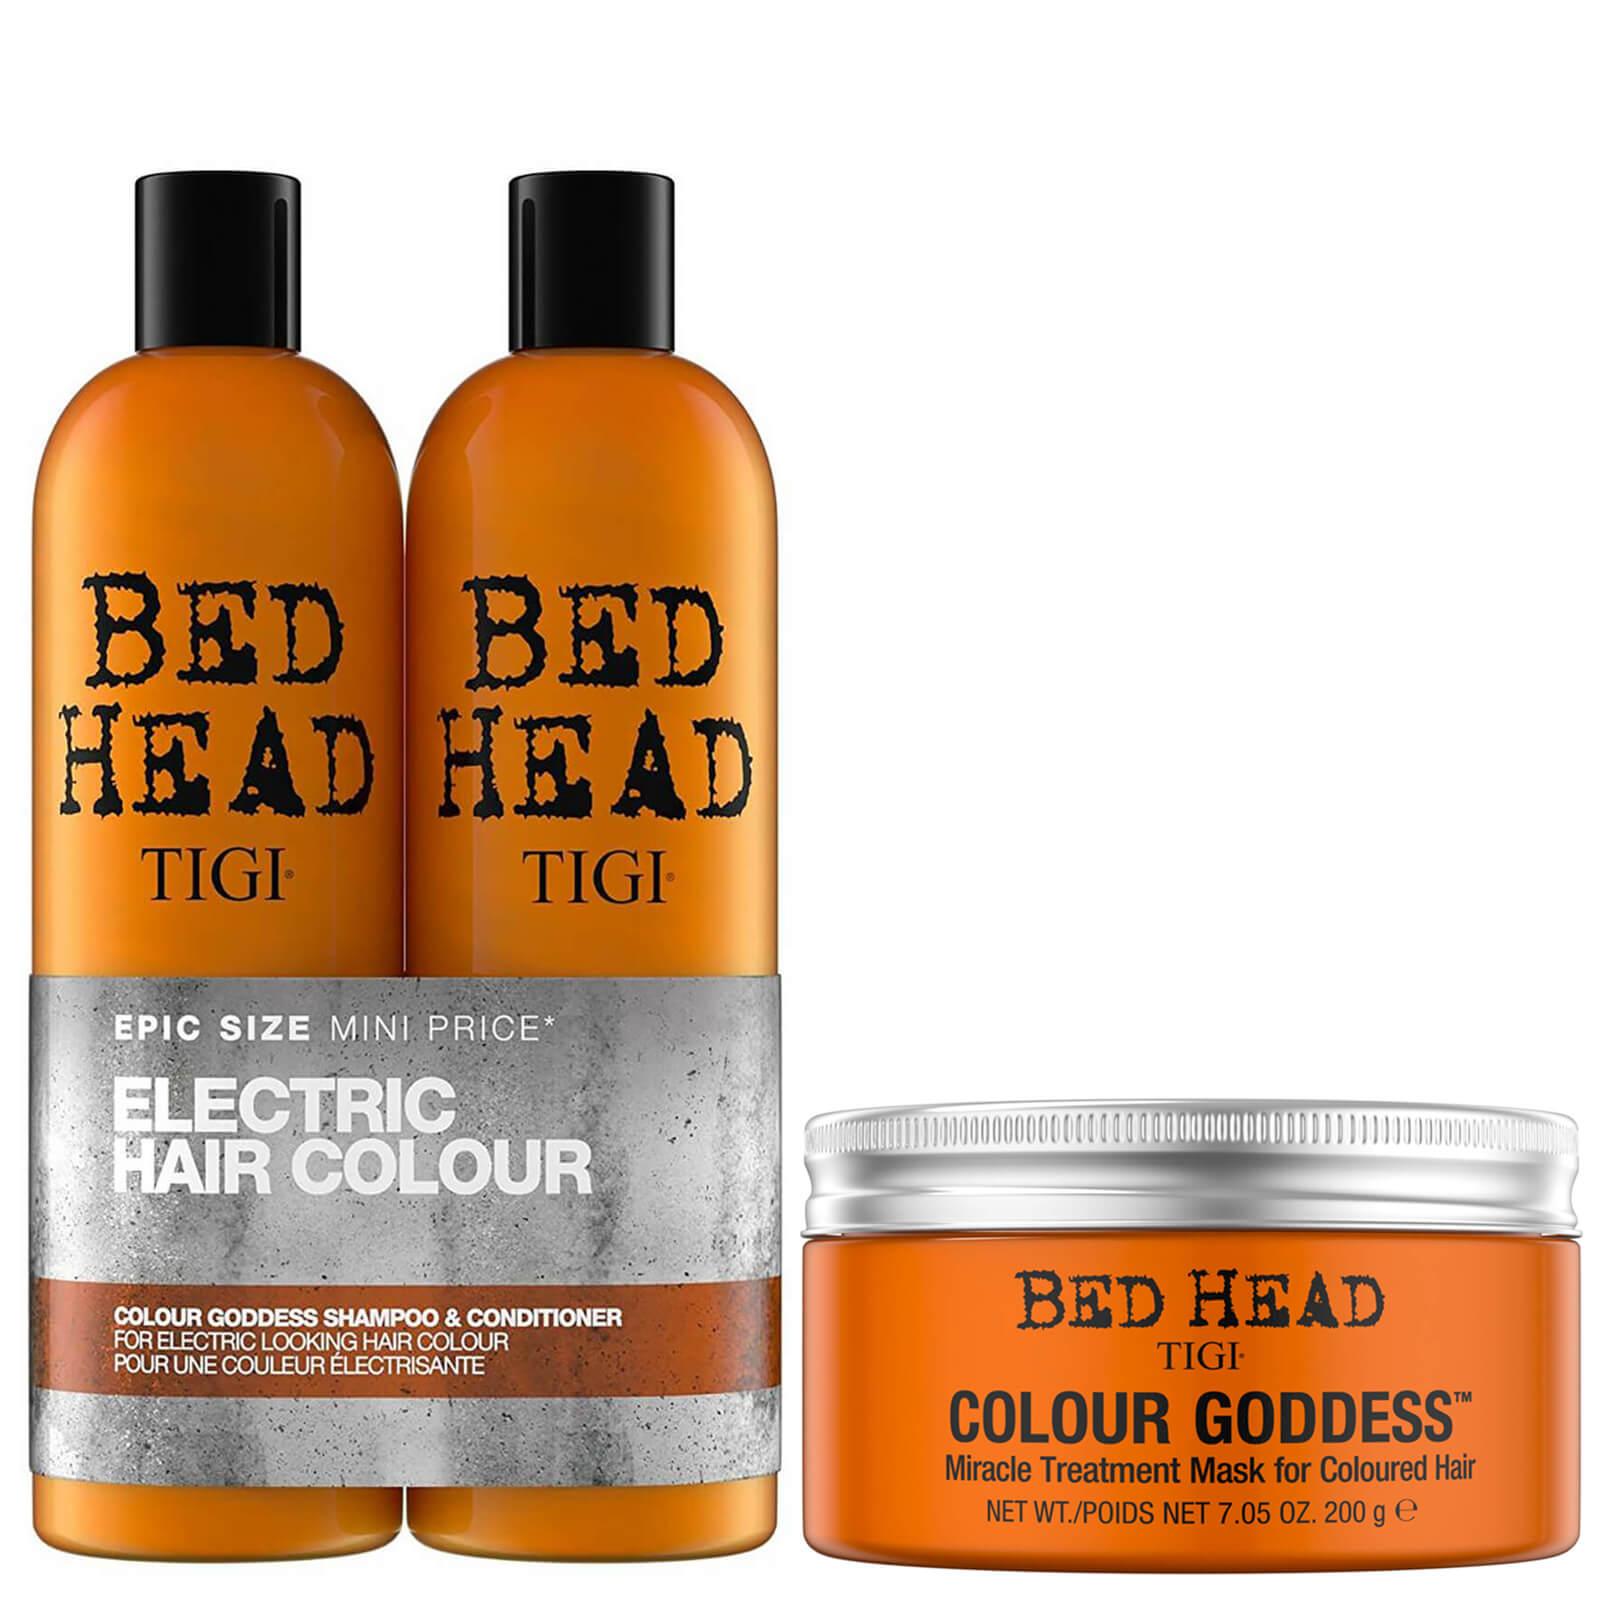 TIGI Bed Head Coloured Hair Shampoo, Conditioner and Hair Mask Set